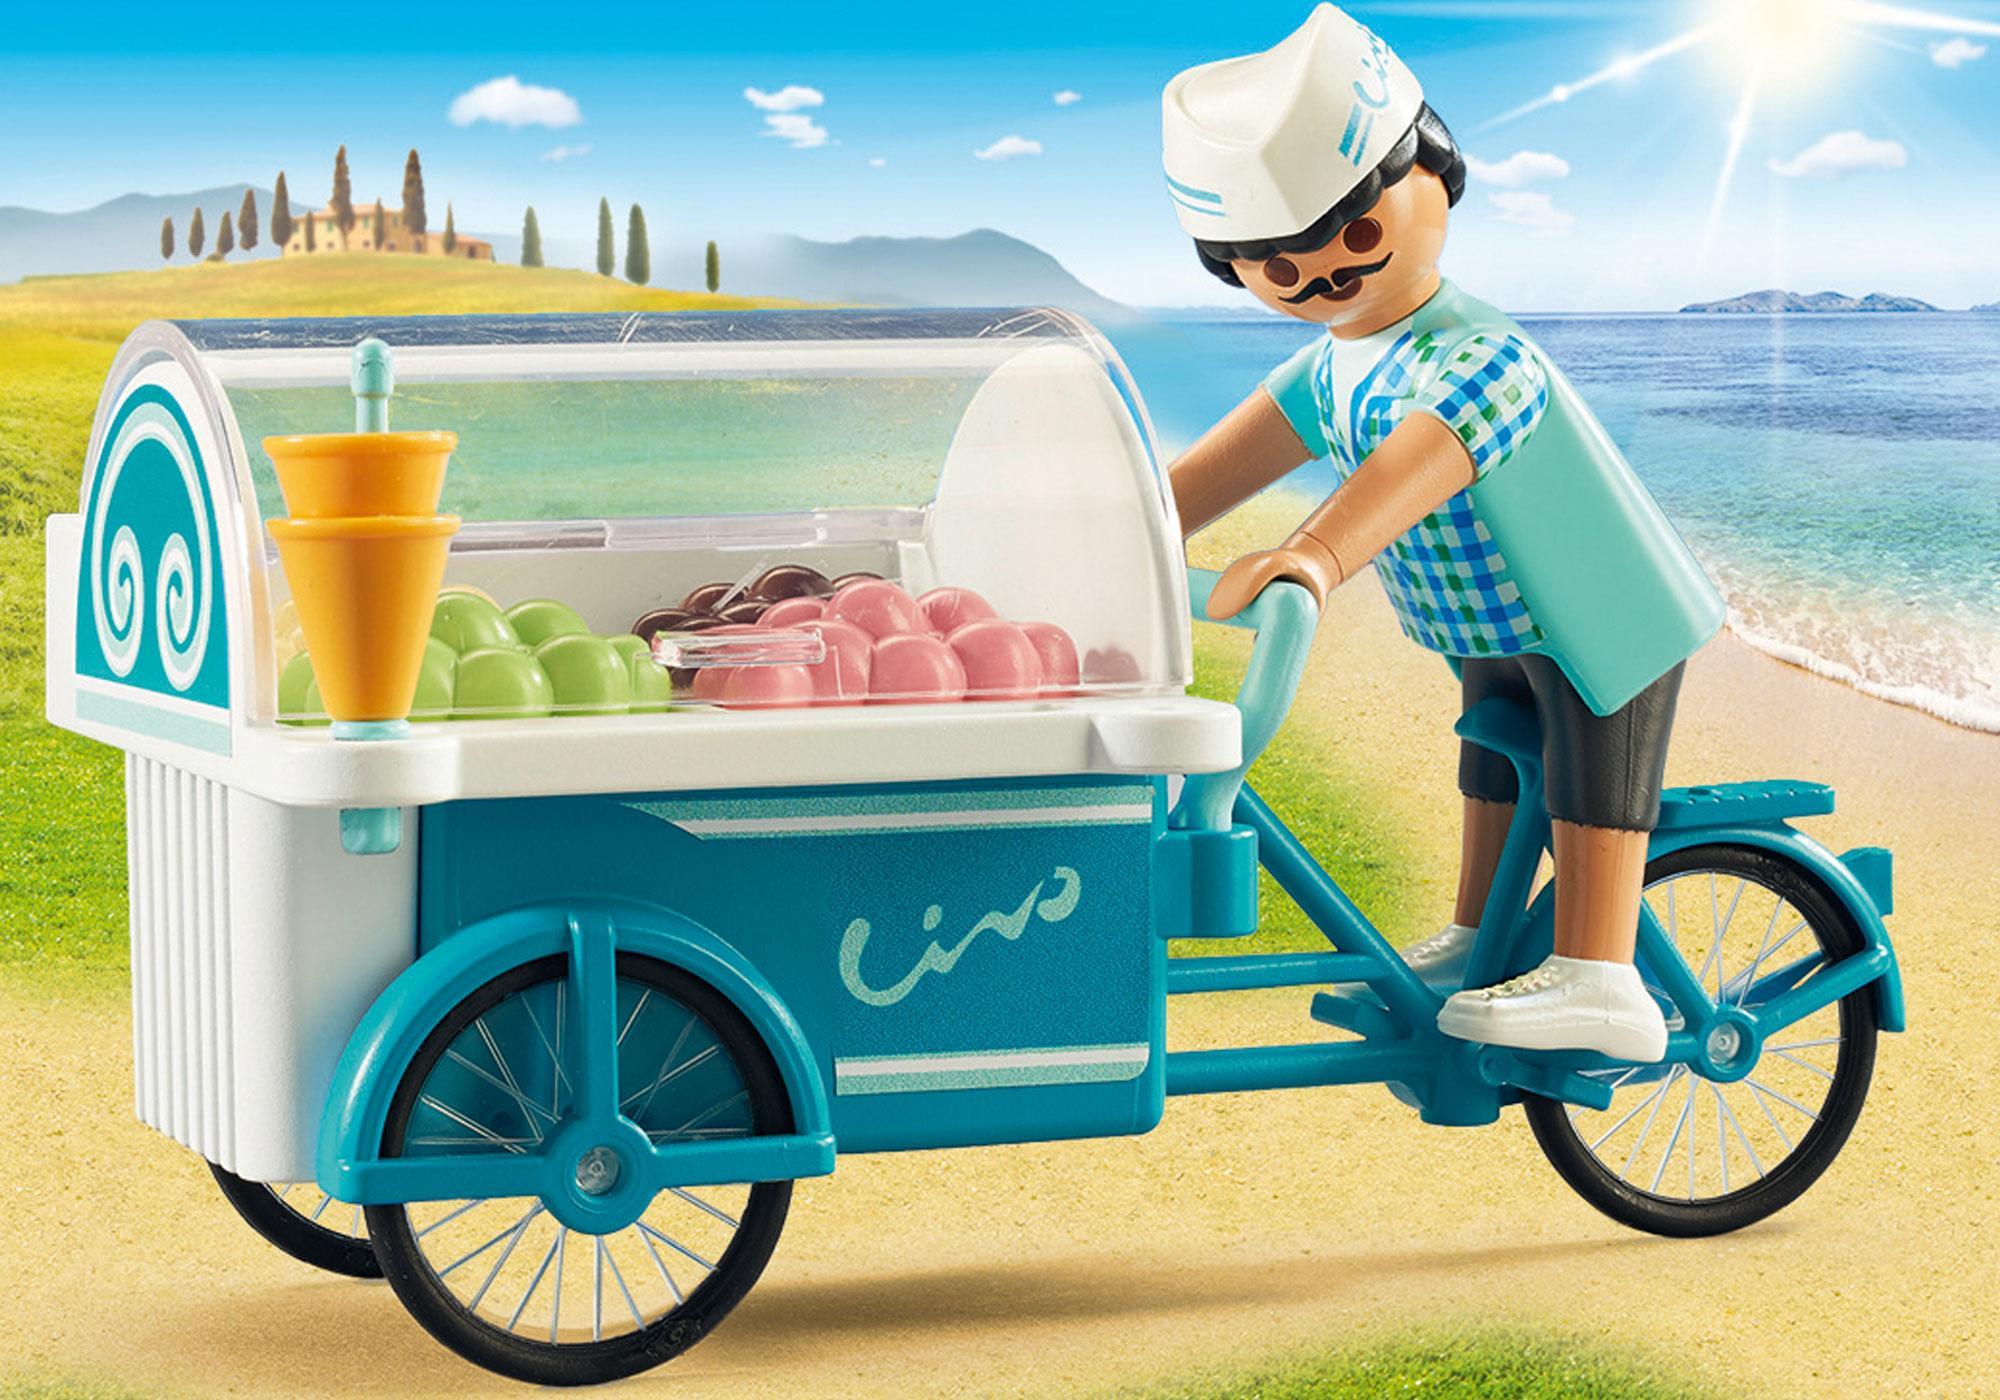 http://media.playmobil.com/i/playmobil/9426_product_extra1/Marchand de glaces et triporteur